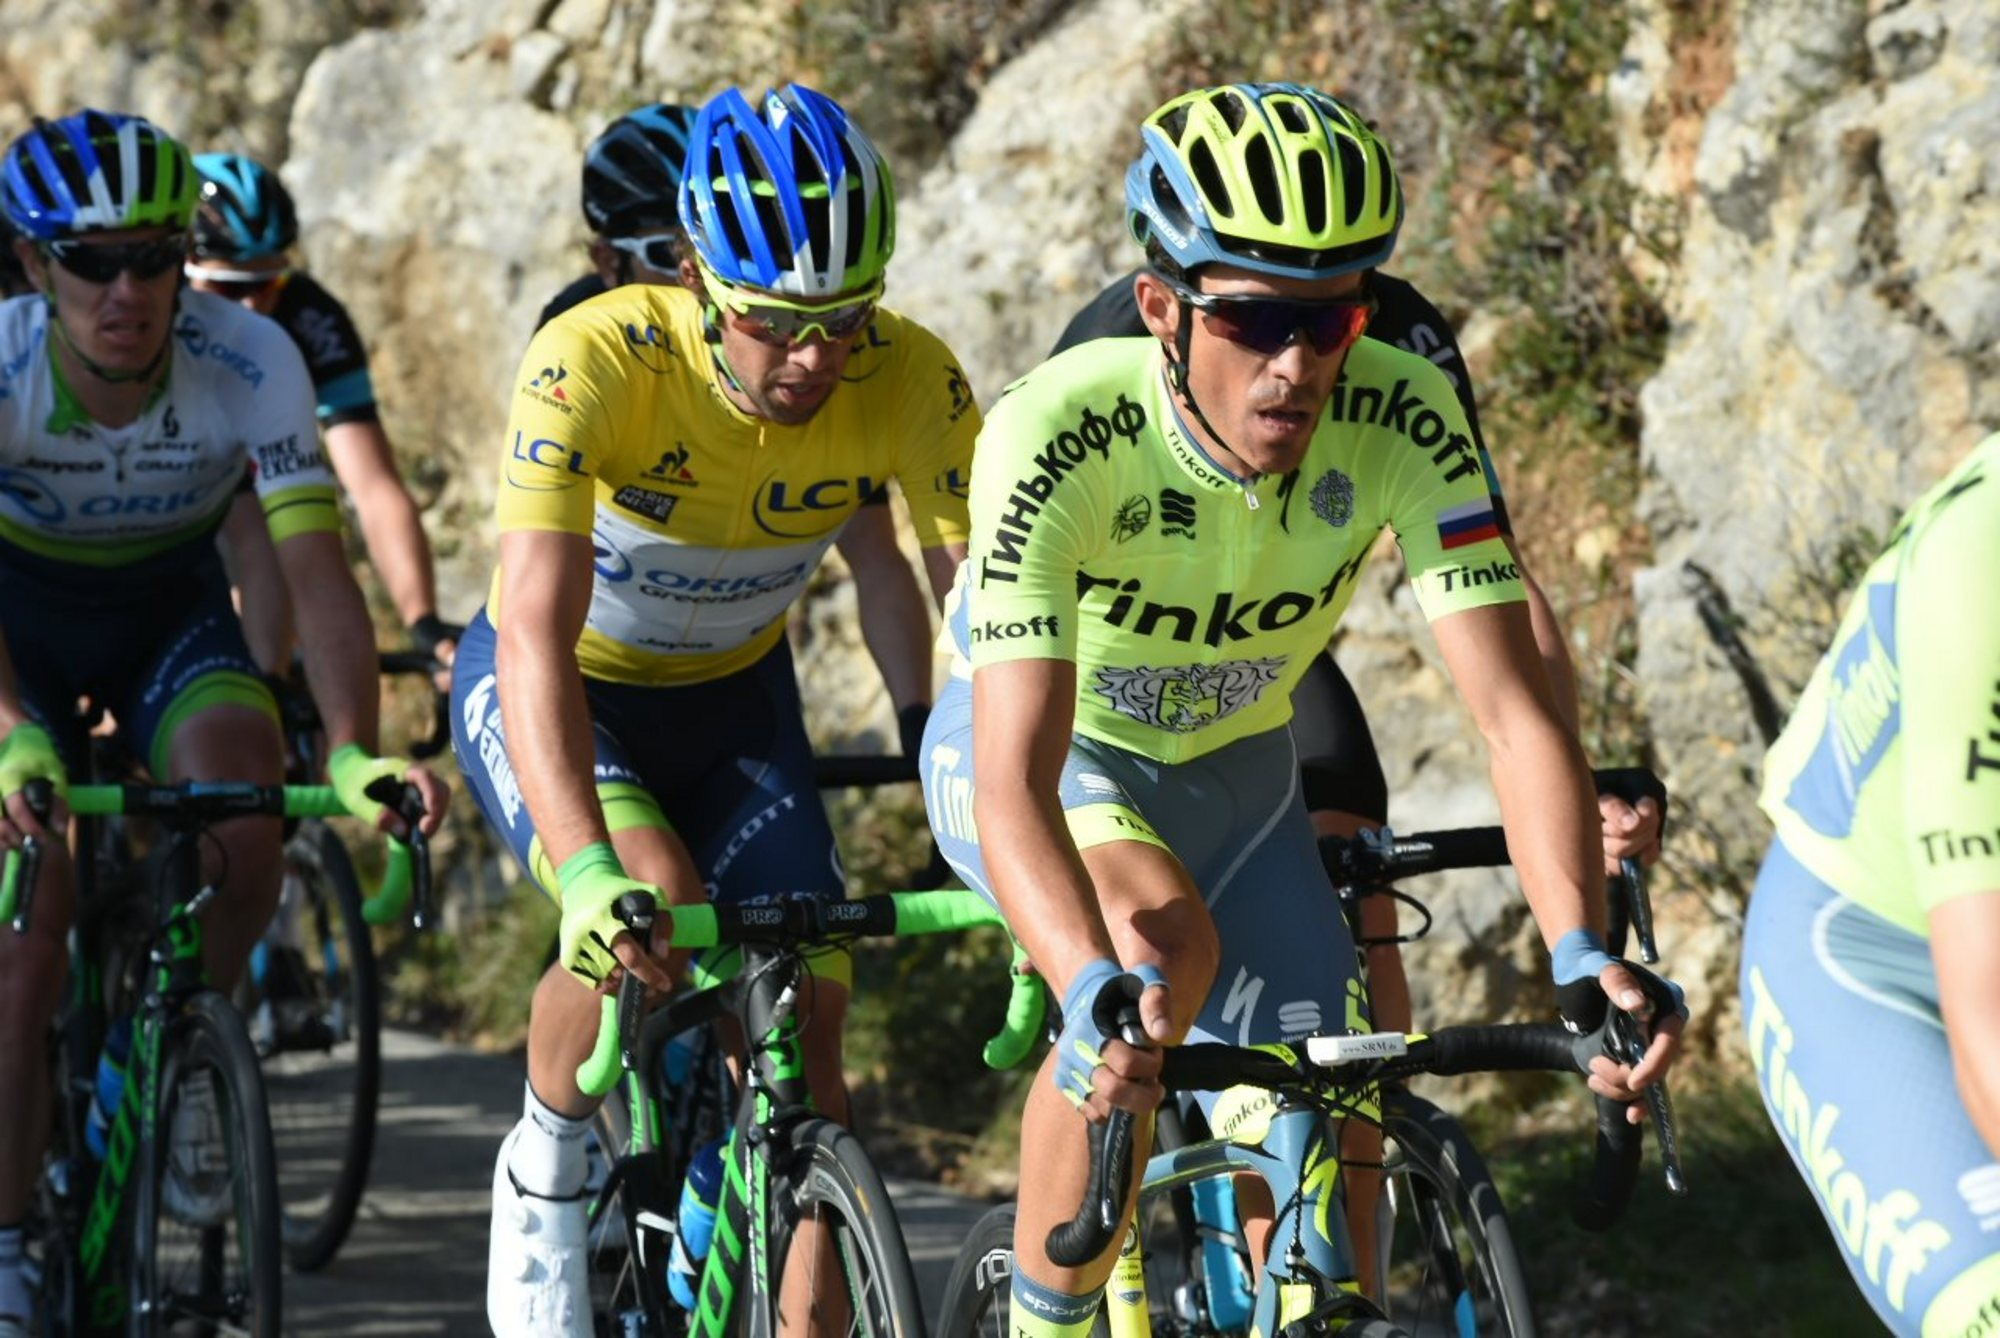 Parigi Nizza 2016 - 6a tappa Nice - La Madone dÕUtelle 177 km - 12/03/2016 - Alberto Contador (Tinkoff) - foto Graham Watson/BettiniPhoto©2016